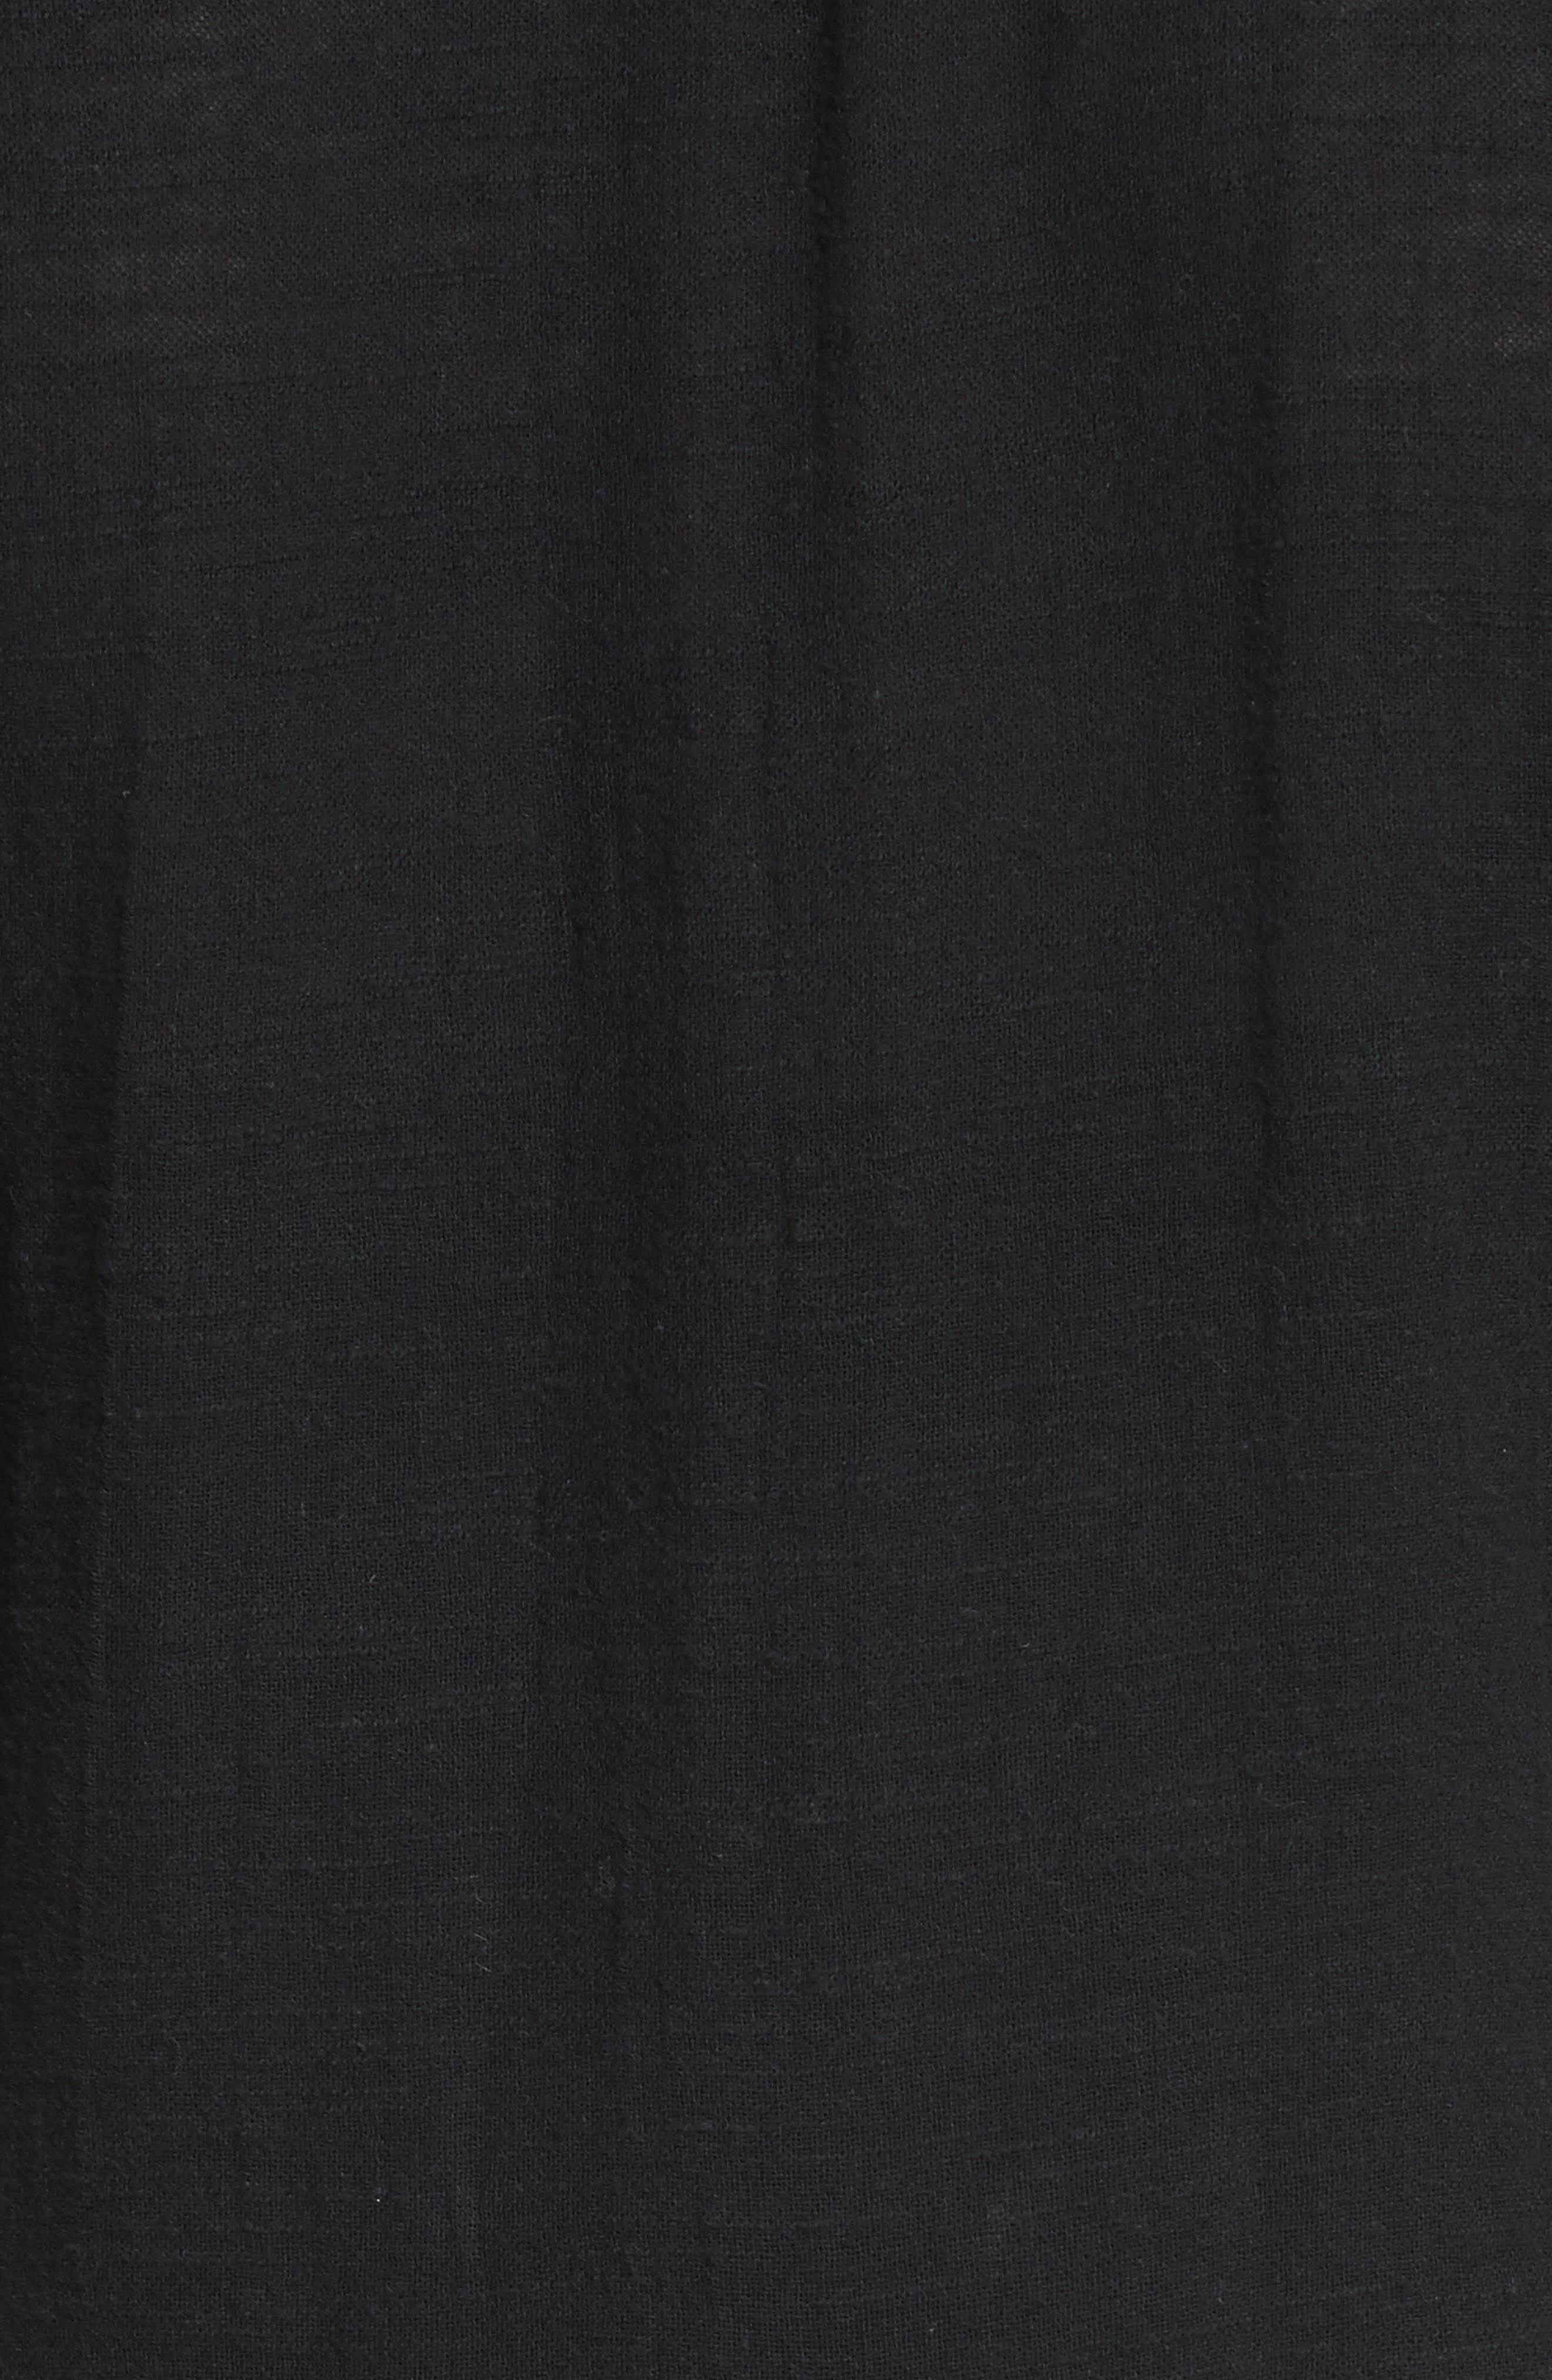 Santiago Embroidered Minidress,                             Alternate thumbnail 5, color,                             Black